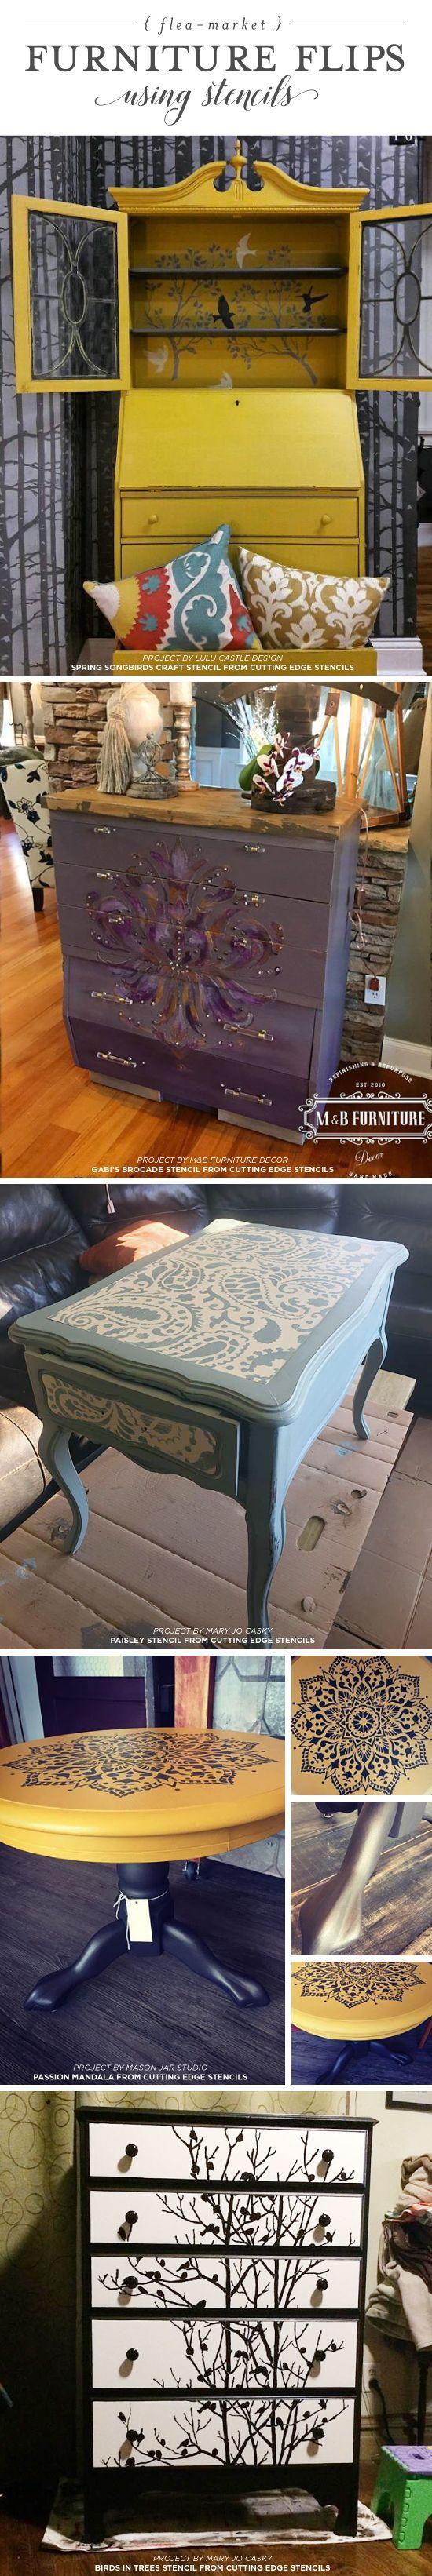 cutting edge furniture. wonderful cutting cutting edge stencils shares diy stenciled furniture ideas using trendy  stencil designs http with furniture o